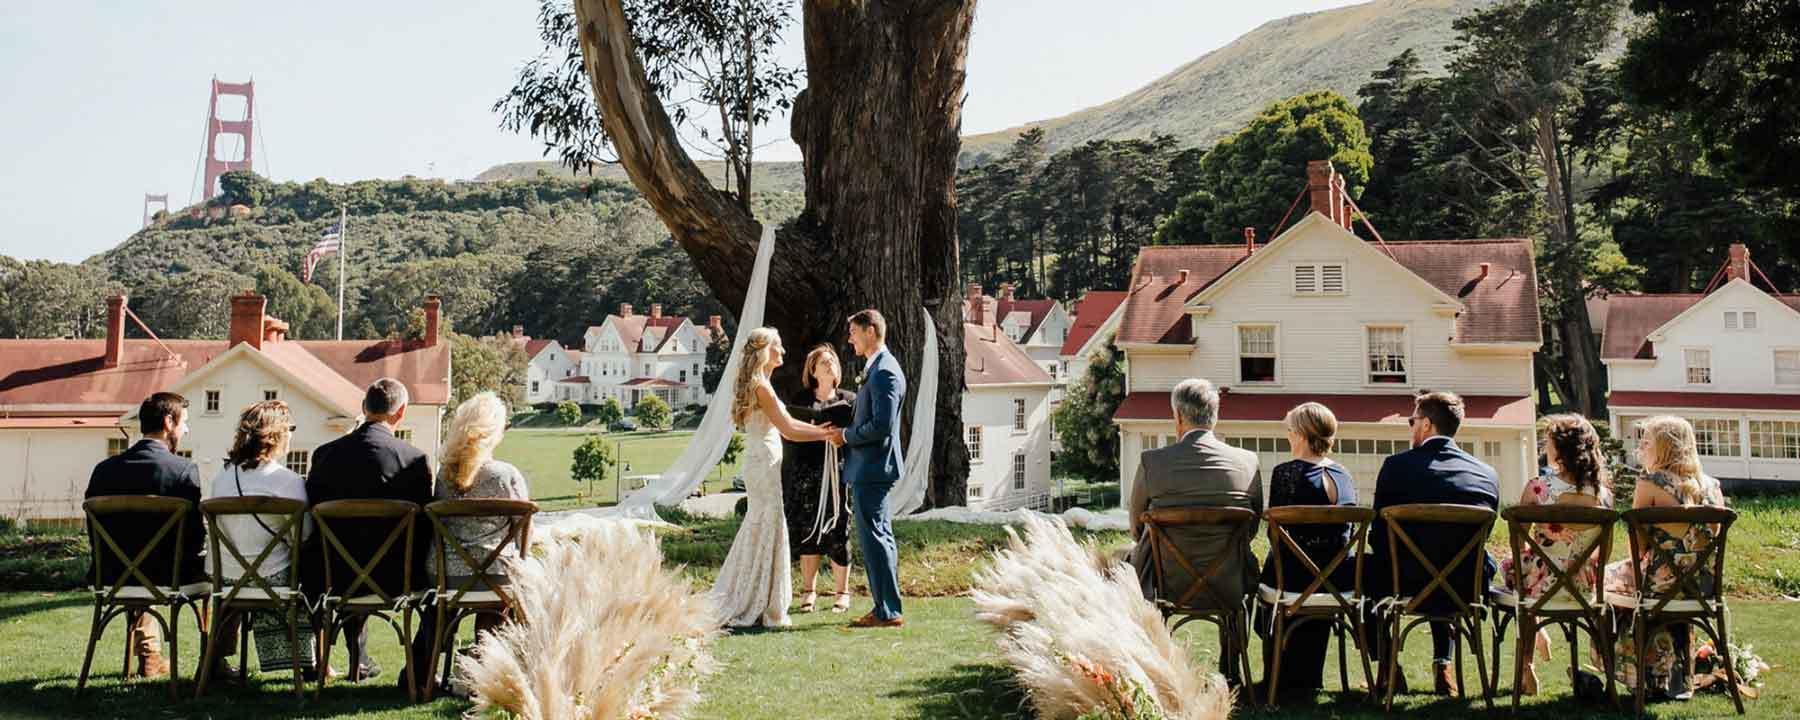 17 Elopement Ideas Intimate Wedding Inspiration